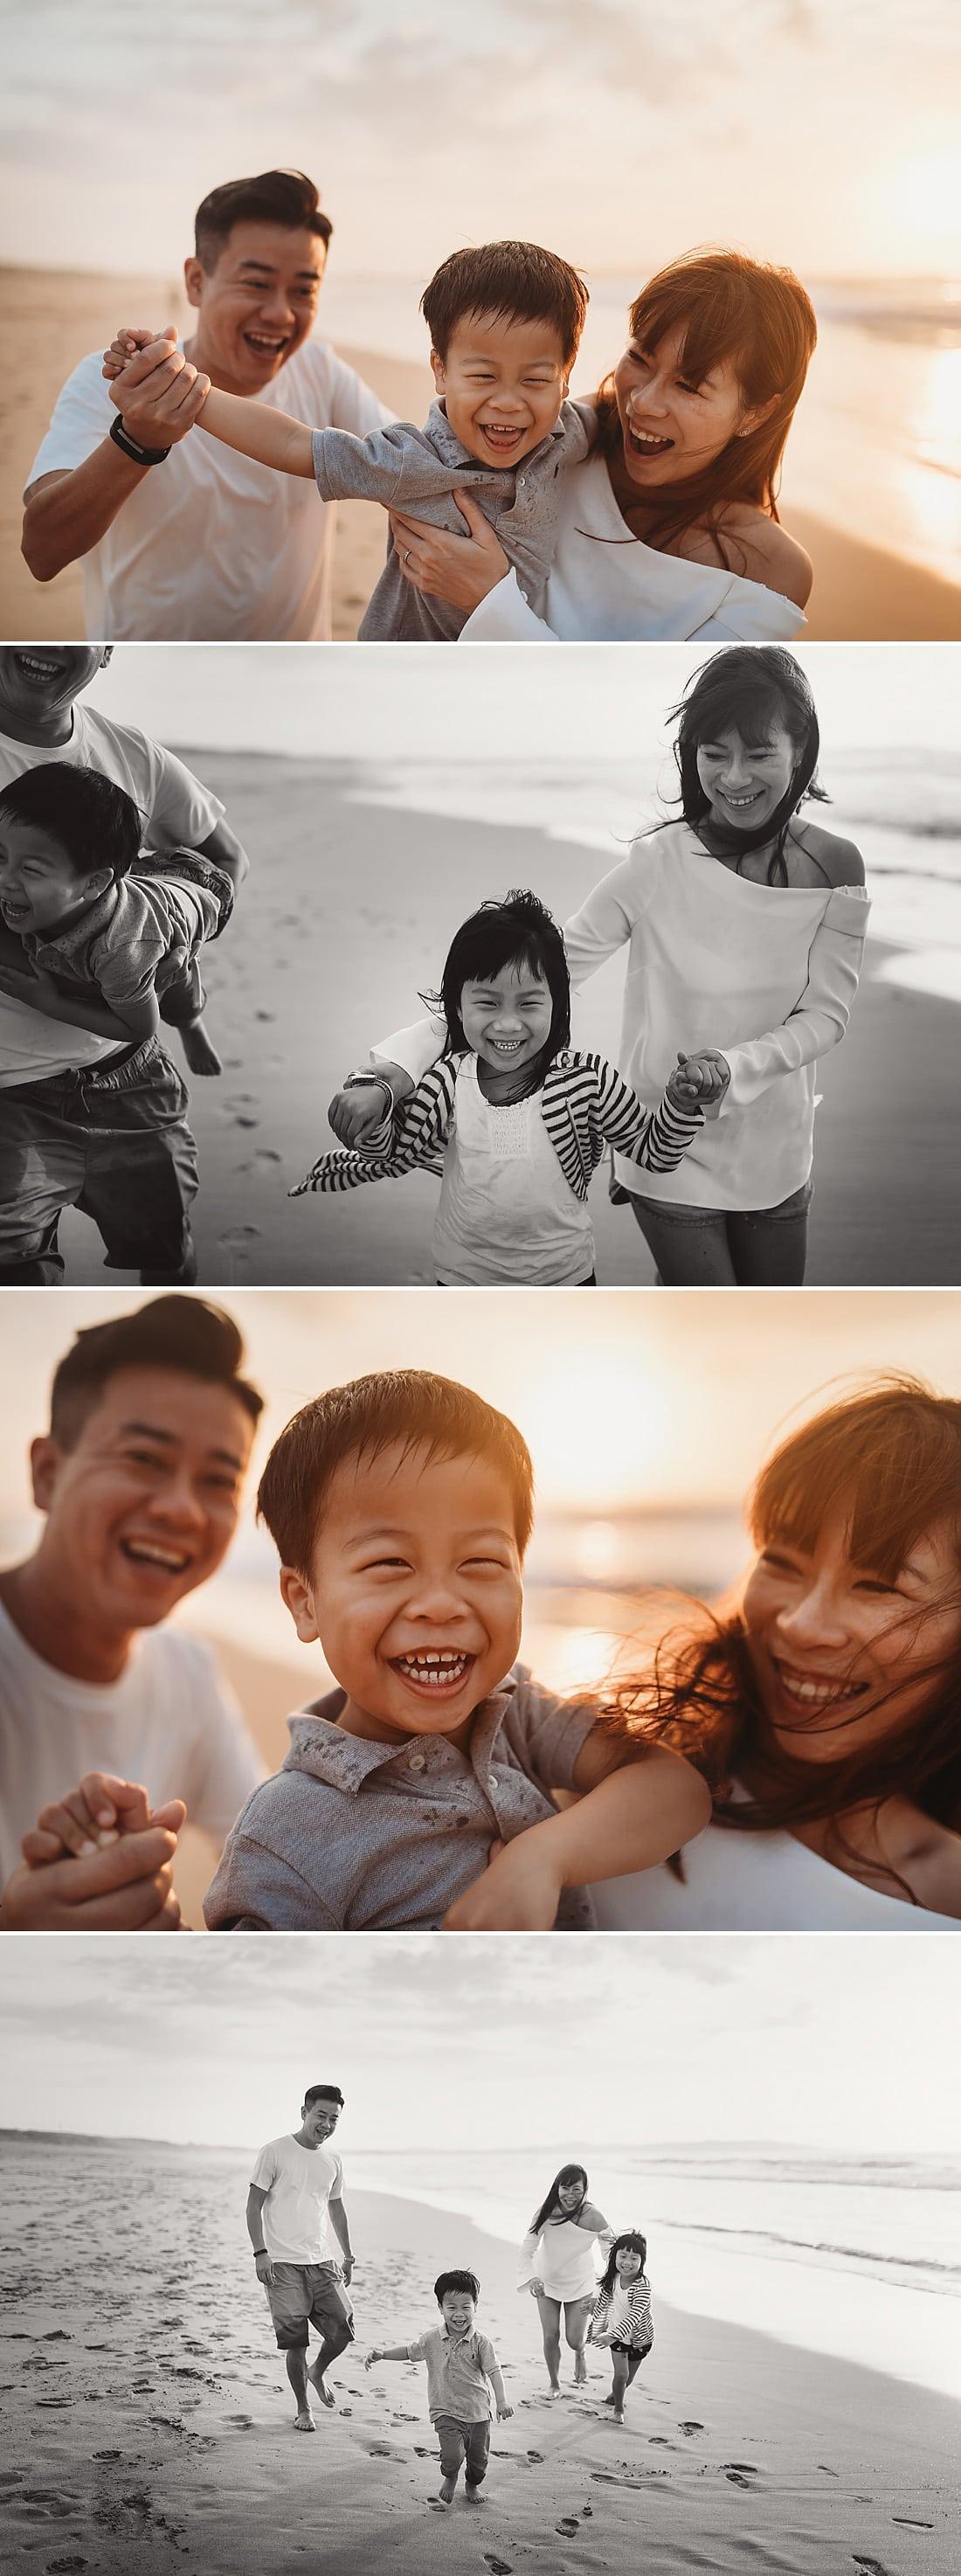 Sutherland-Shire-Family-photography-Wollongong